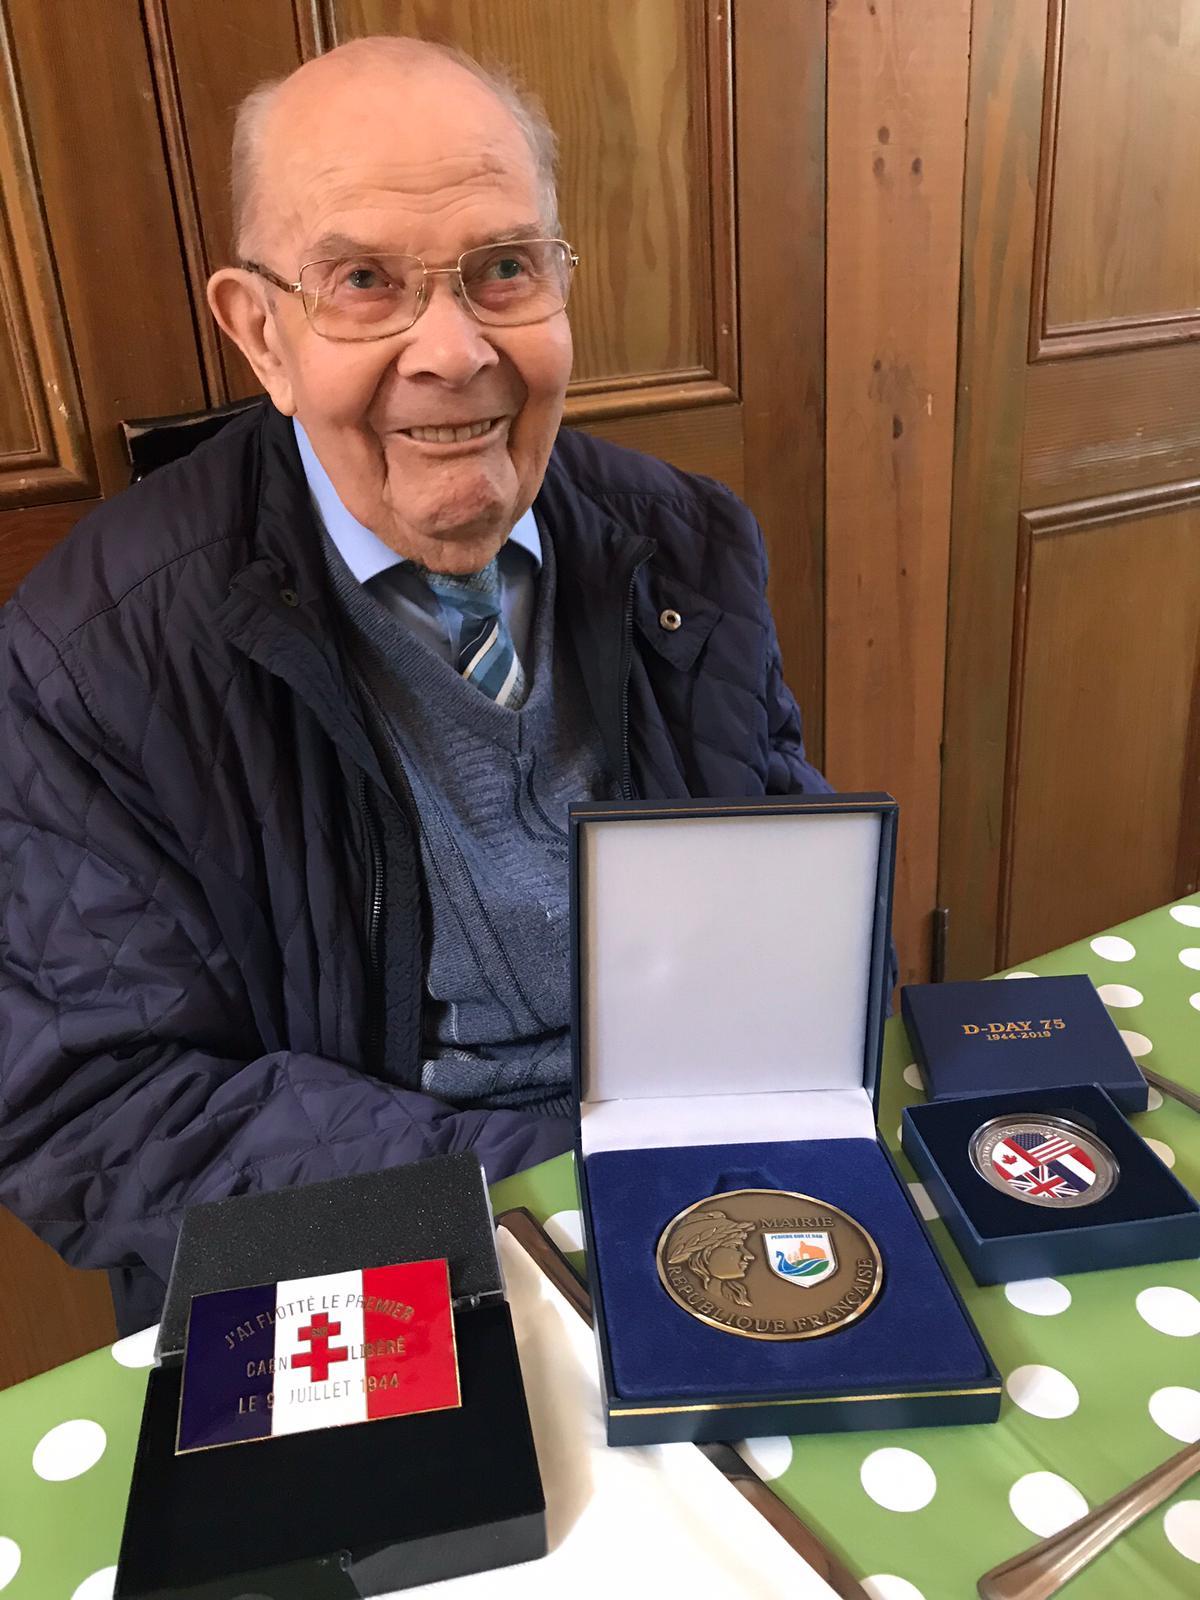 Photo of Bert with war medals